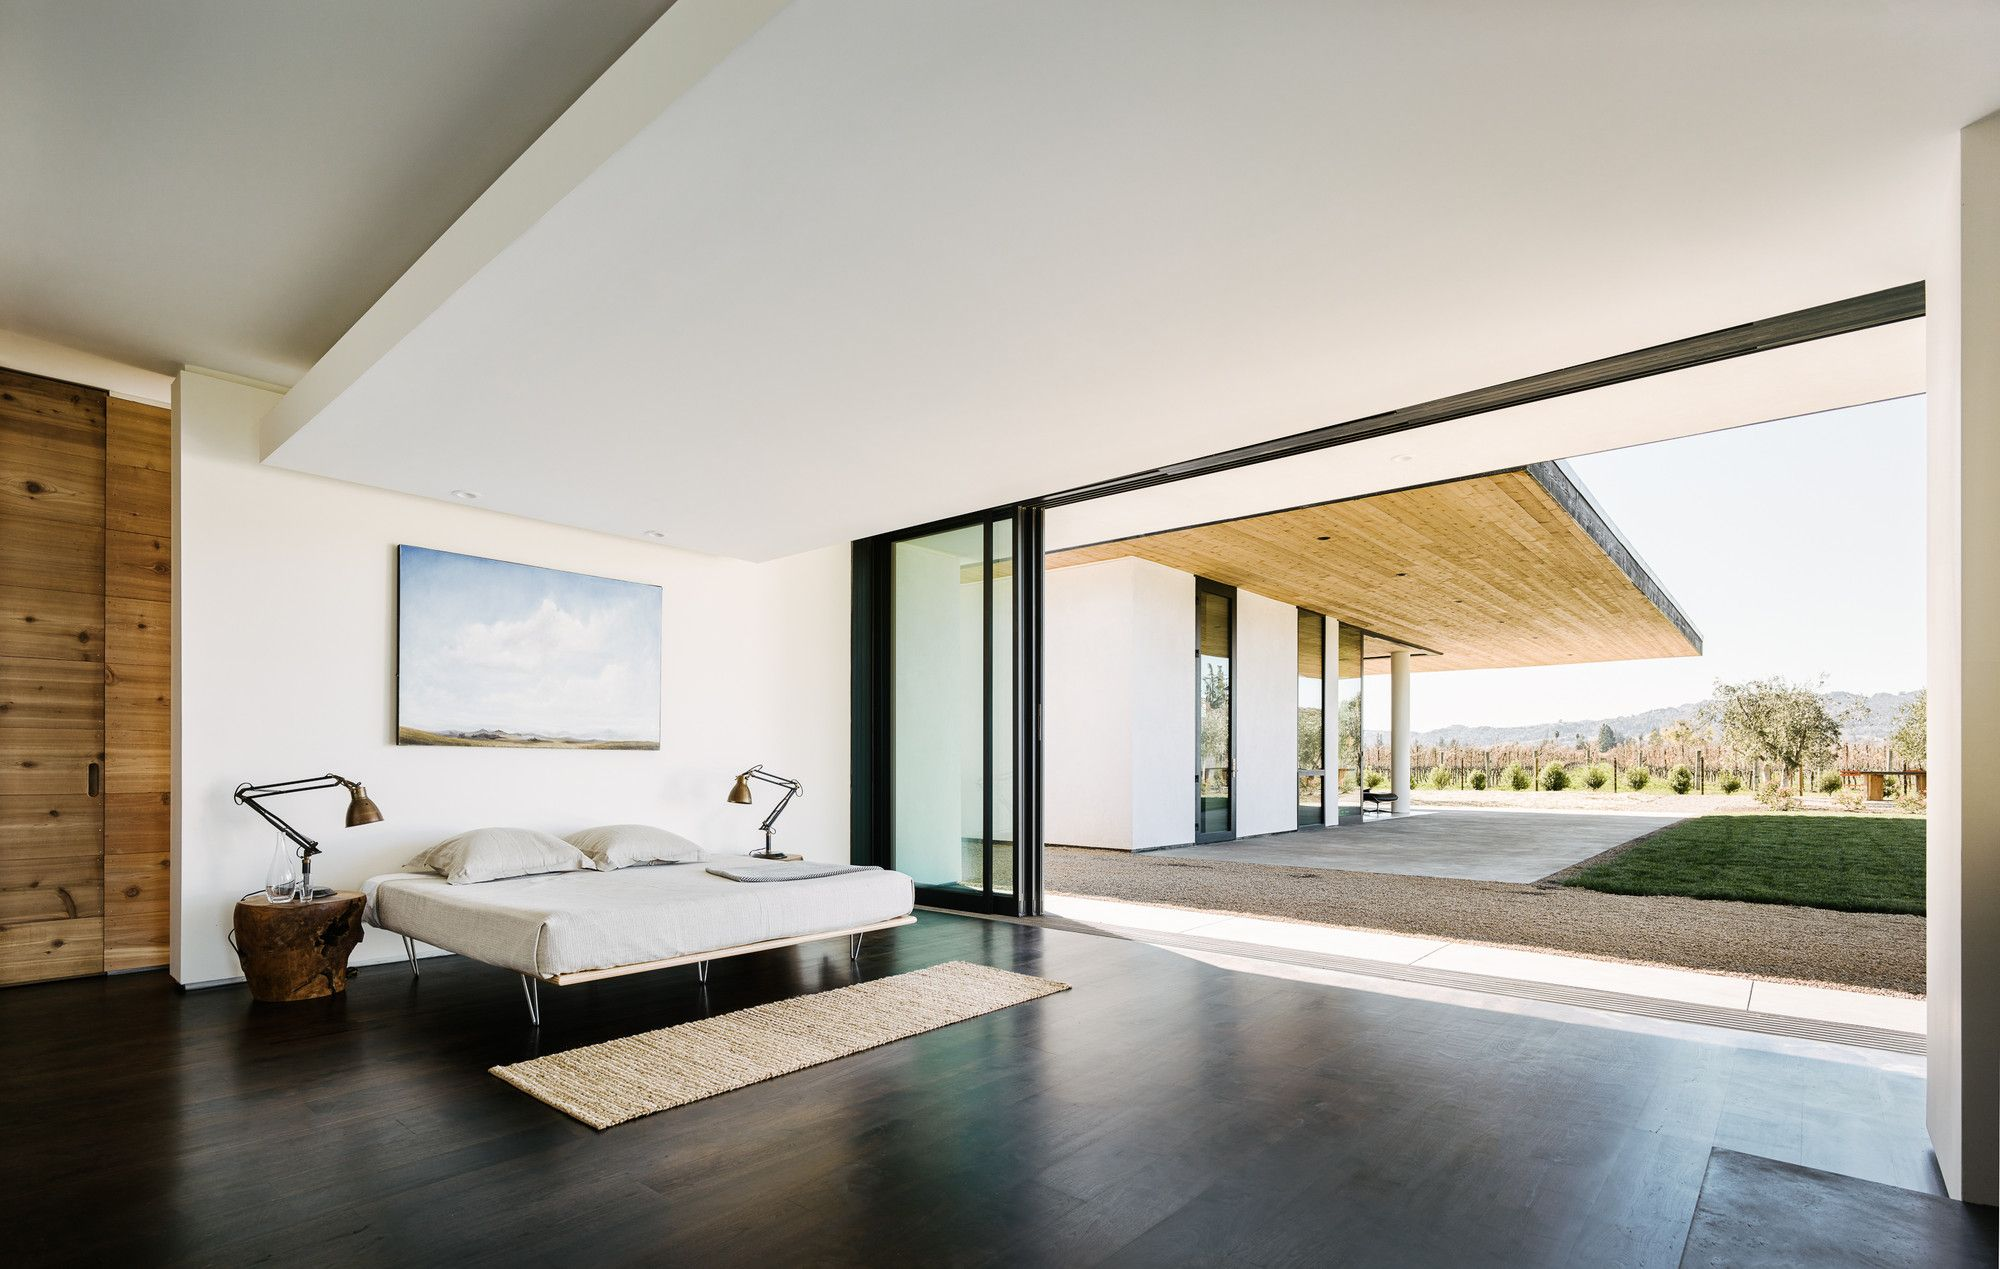 http://blog.gessato.com/wp-content/uploads/2016/05/a-contemporary-home-set-on-the-napa-valley-floor-gessato-8.jpg